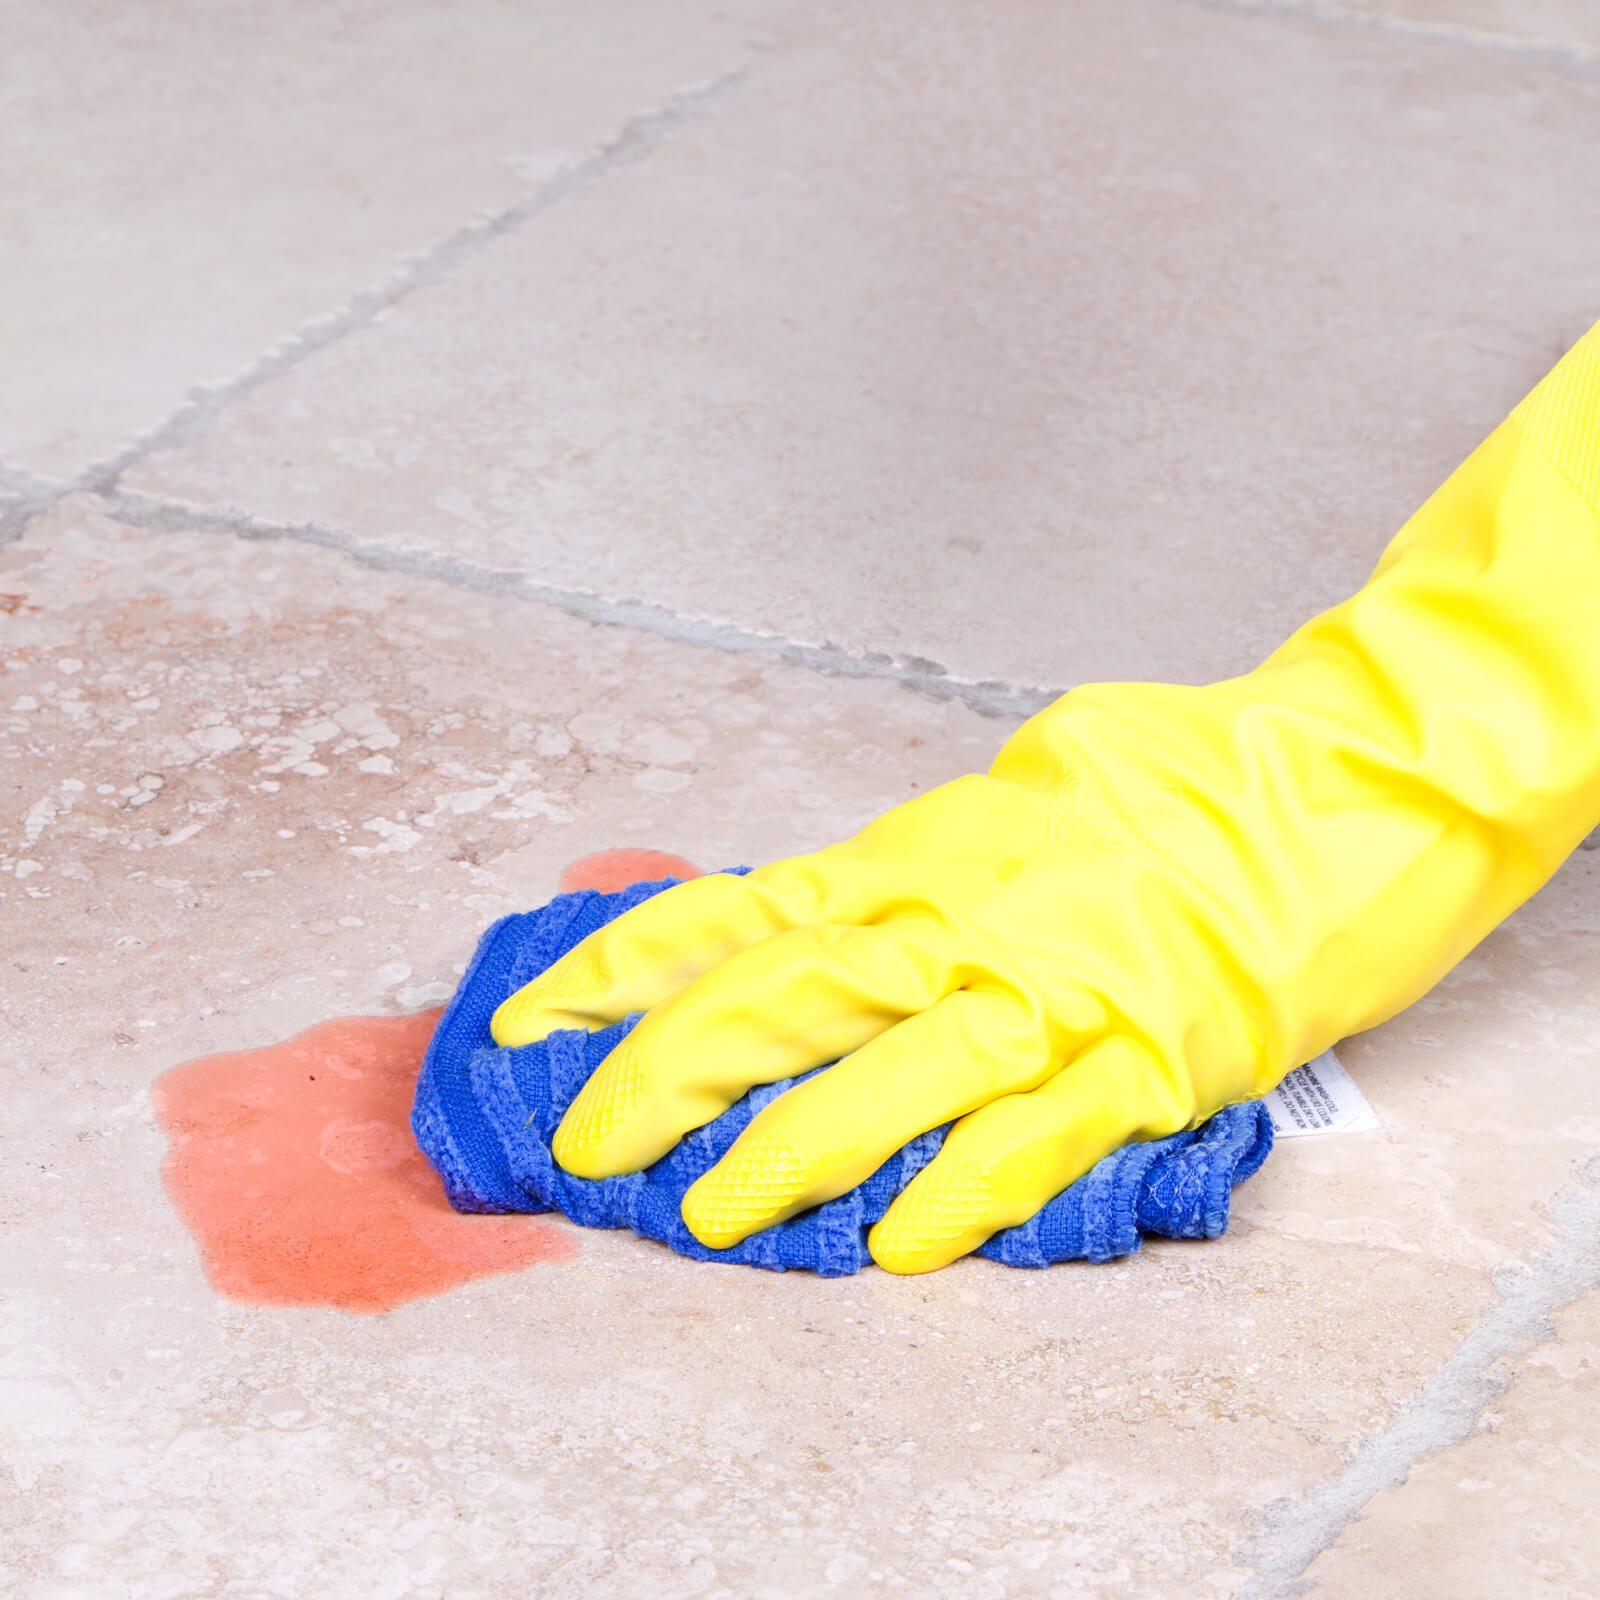 Tile cleaning | McCool's Flooring